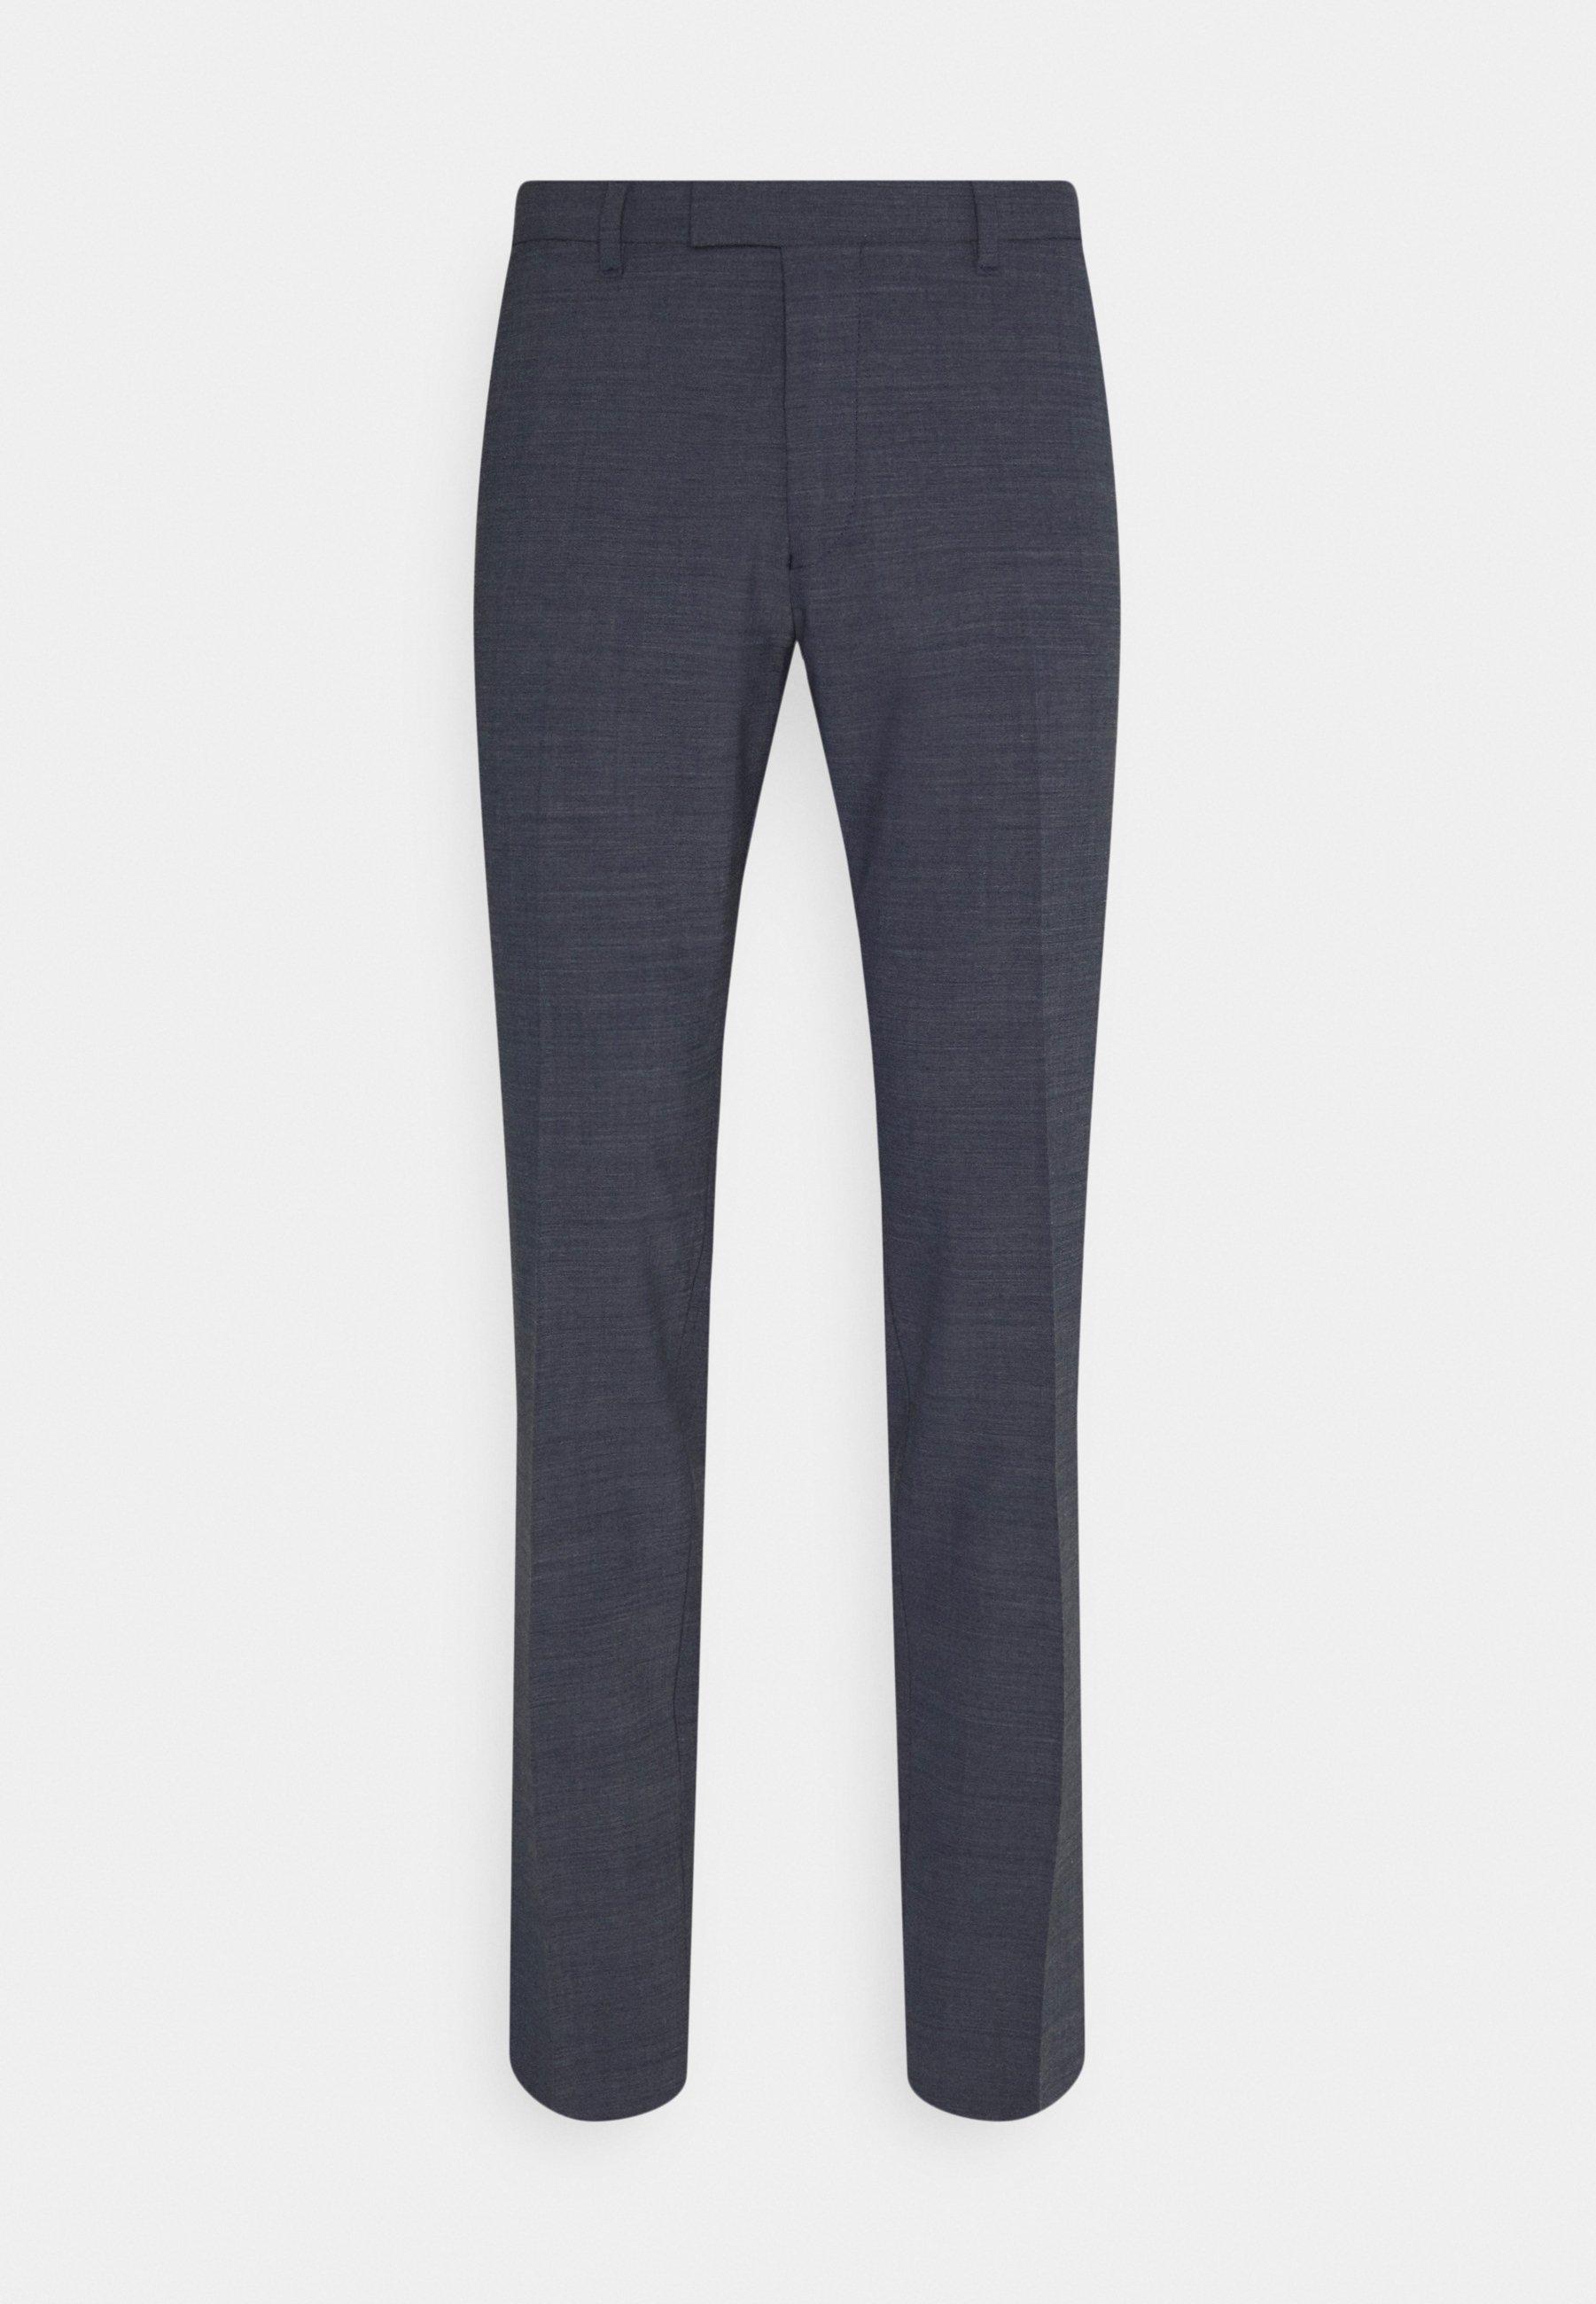 Uomo BILBAO - Pantaloni